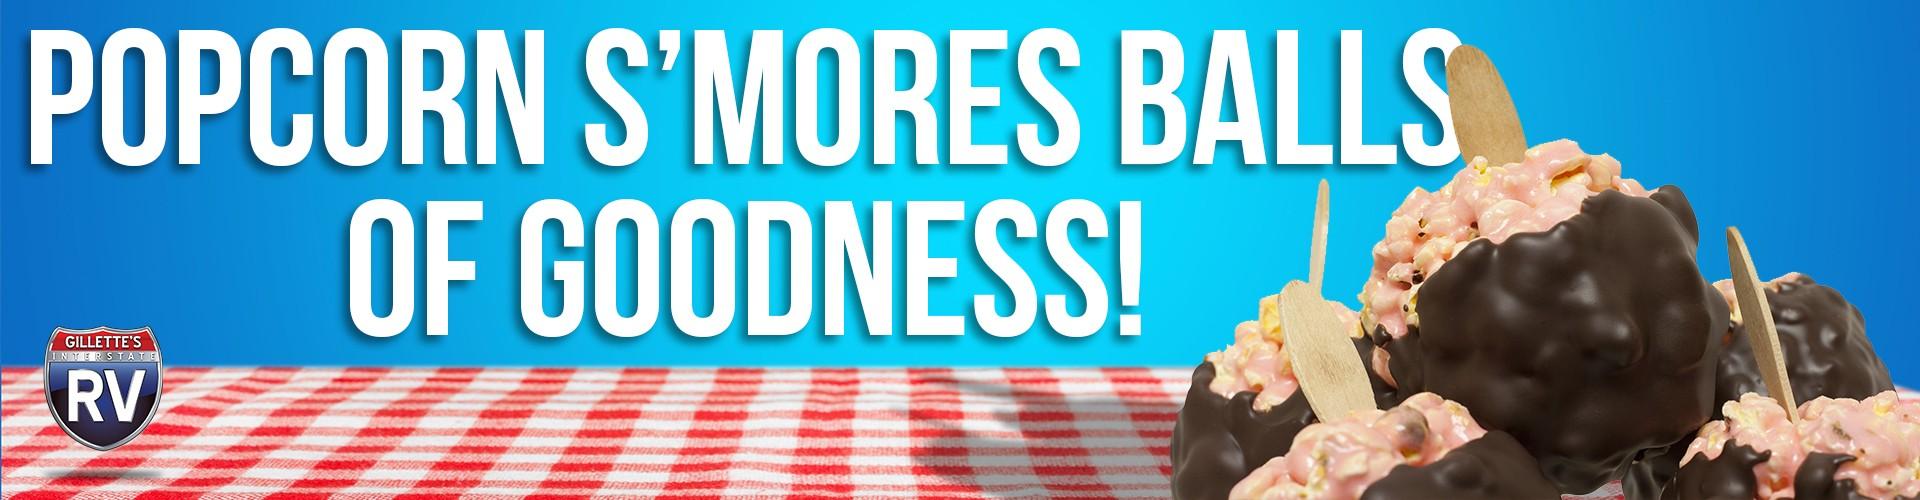 Popcorn S'mores Balls of Goodness!